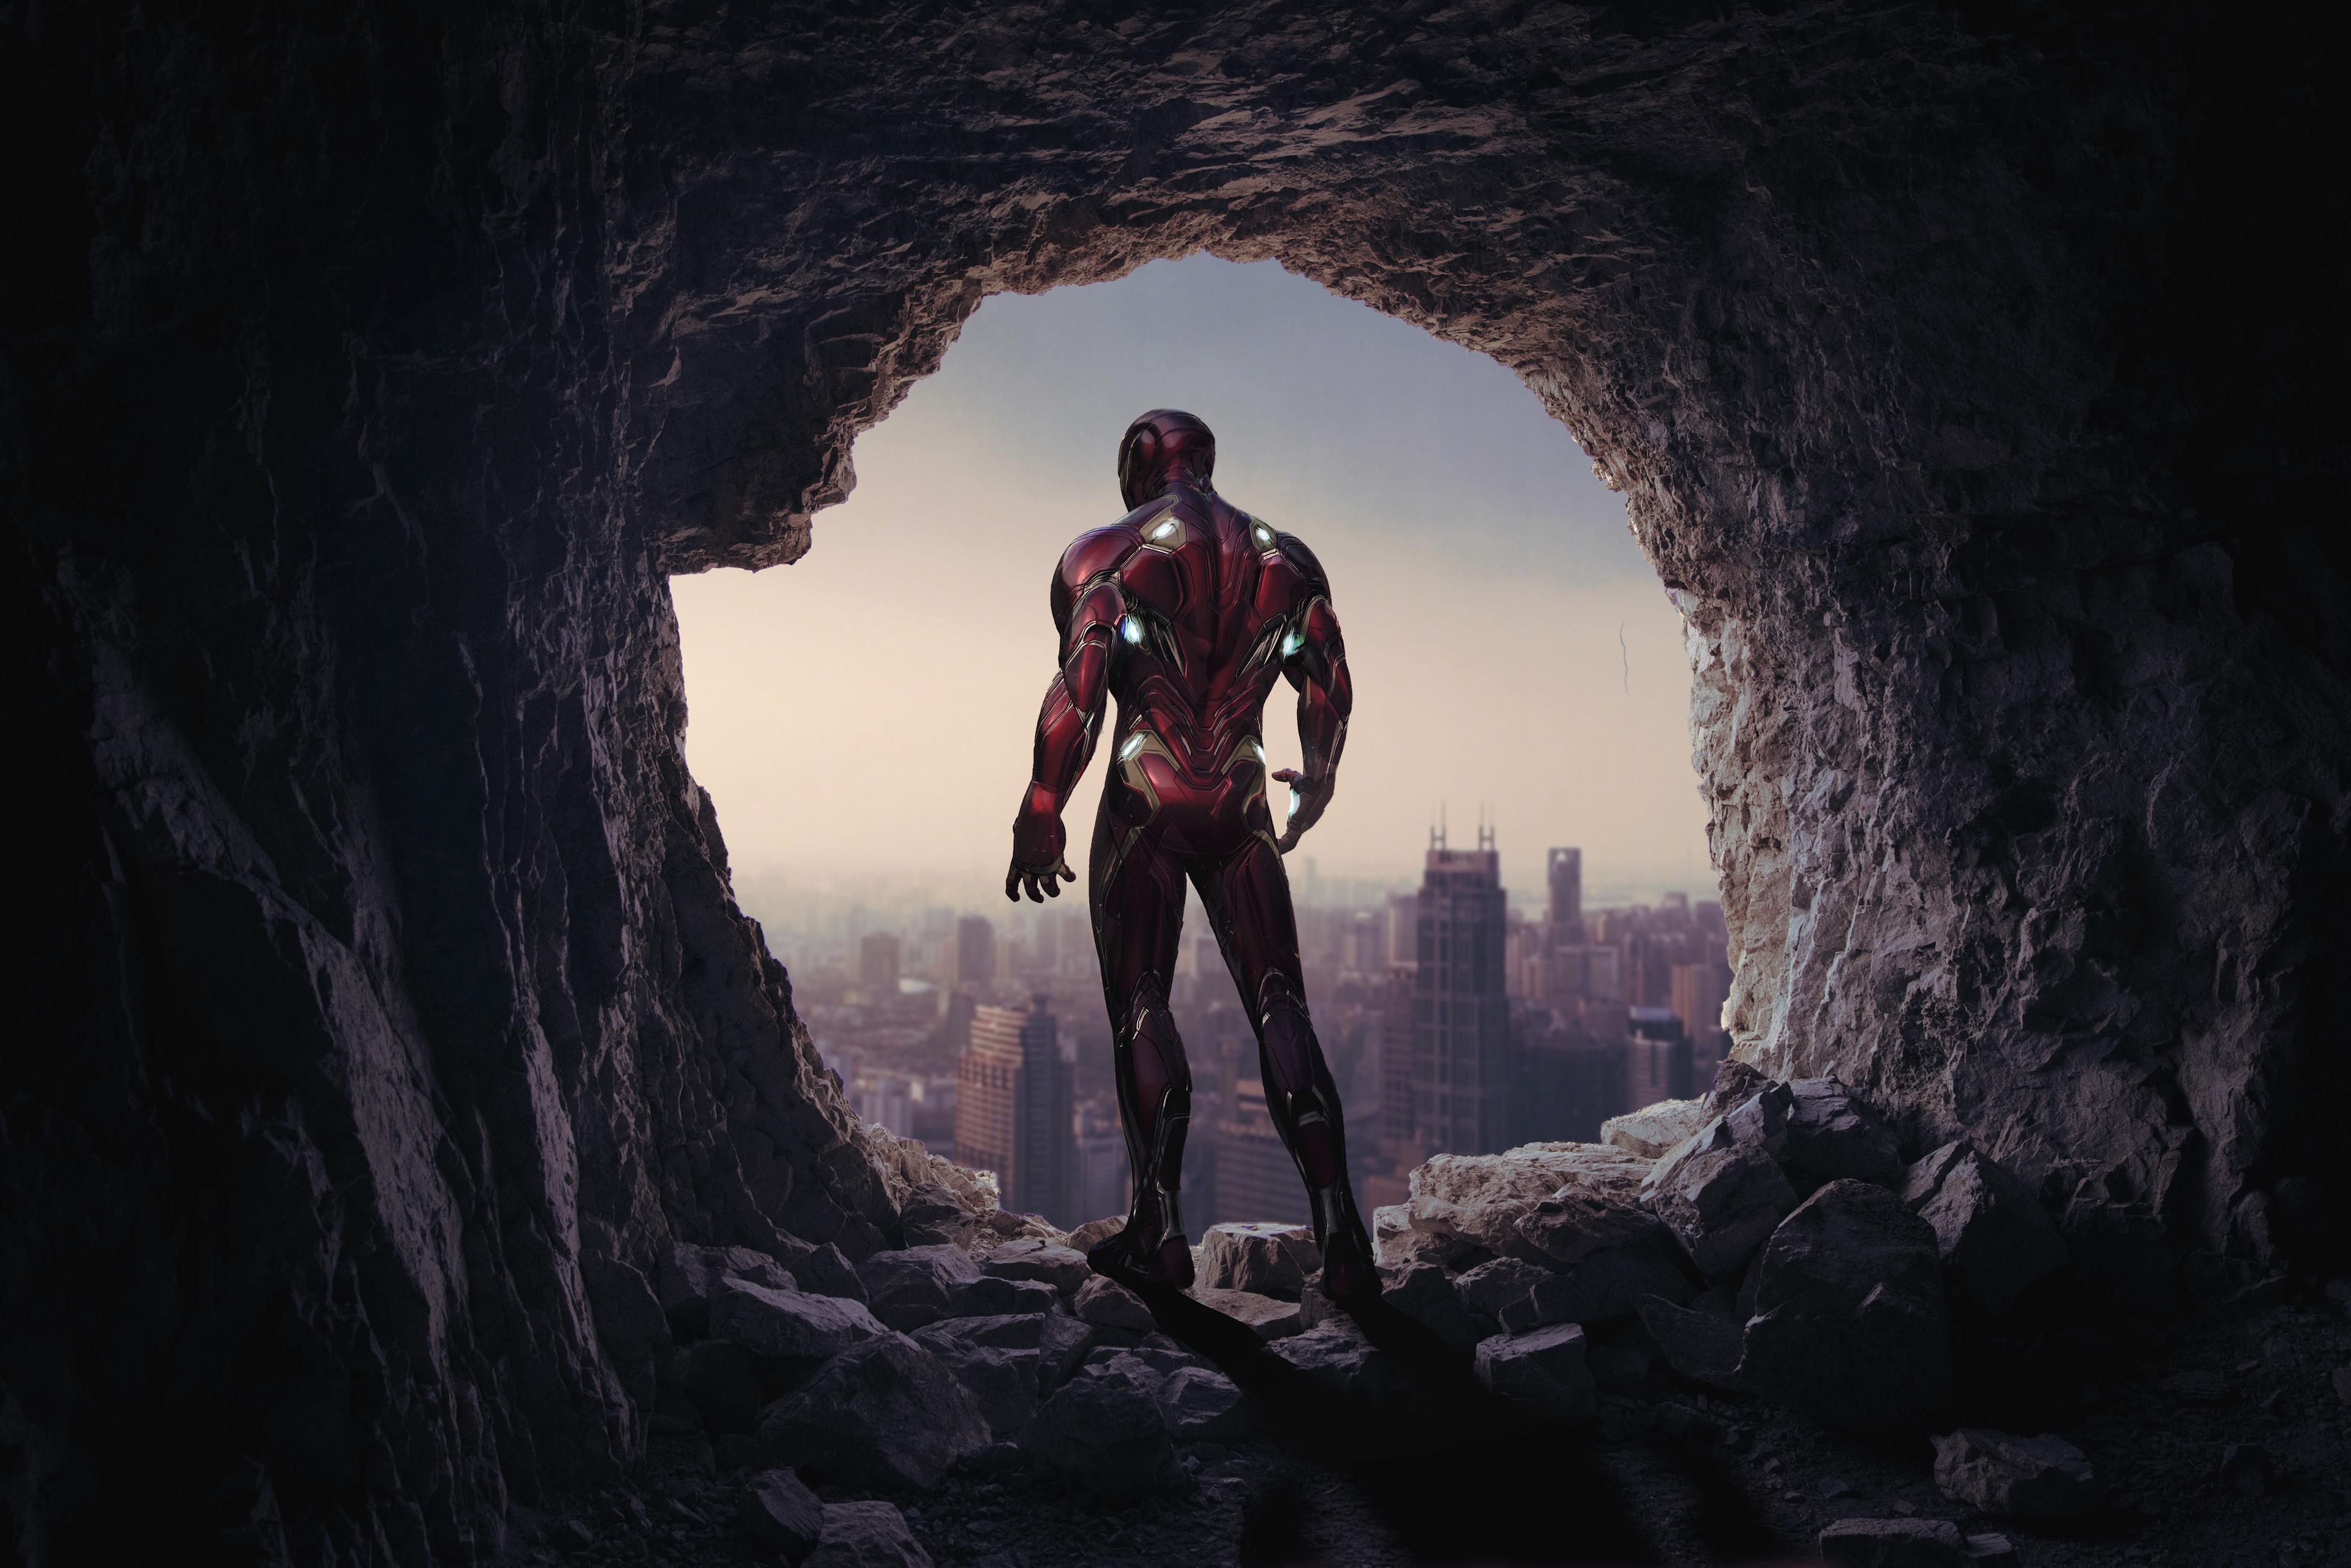 1920x1080 Iron Man Cave 4k 1080p Laptop Full Hd Wallpaper